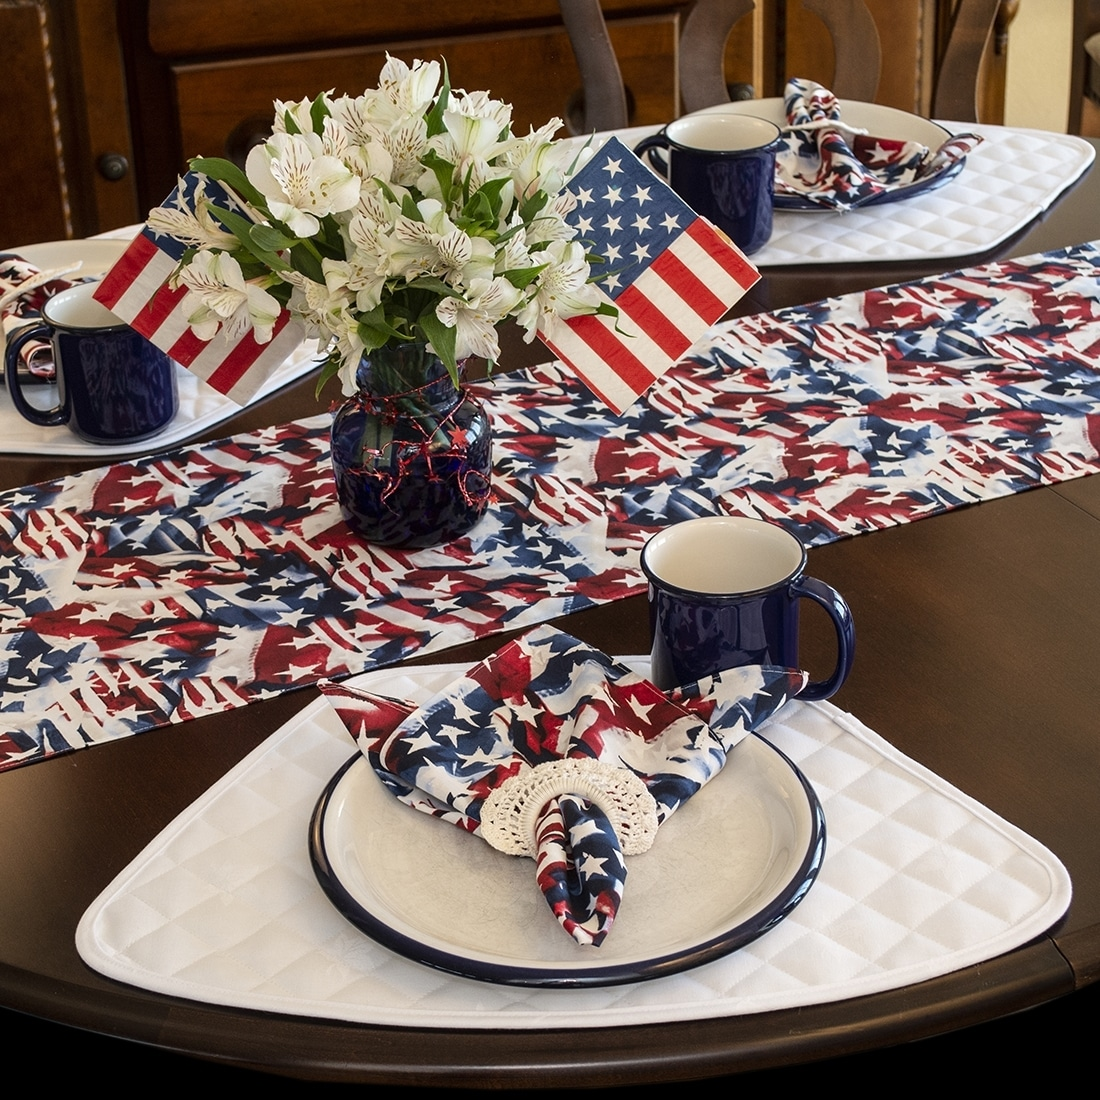 Sweet Pea Linens - Red, White & Blue, Stars & Stripes Flag 72 inch Table Runner (SKU#: R-1024-A7) - Alternate Table Setting